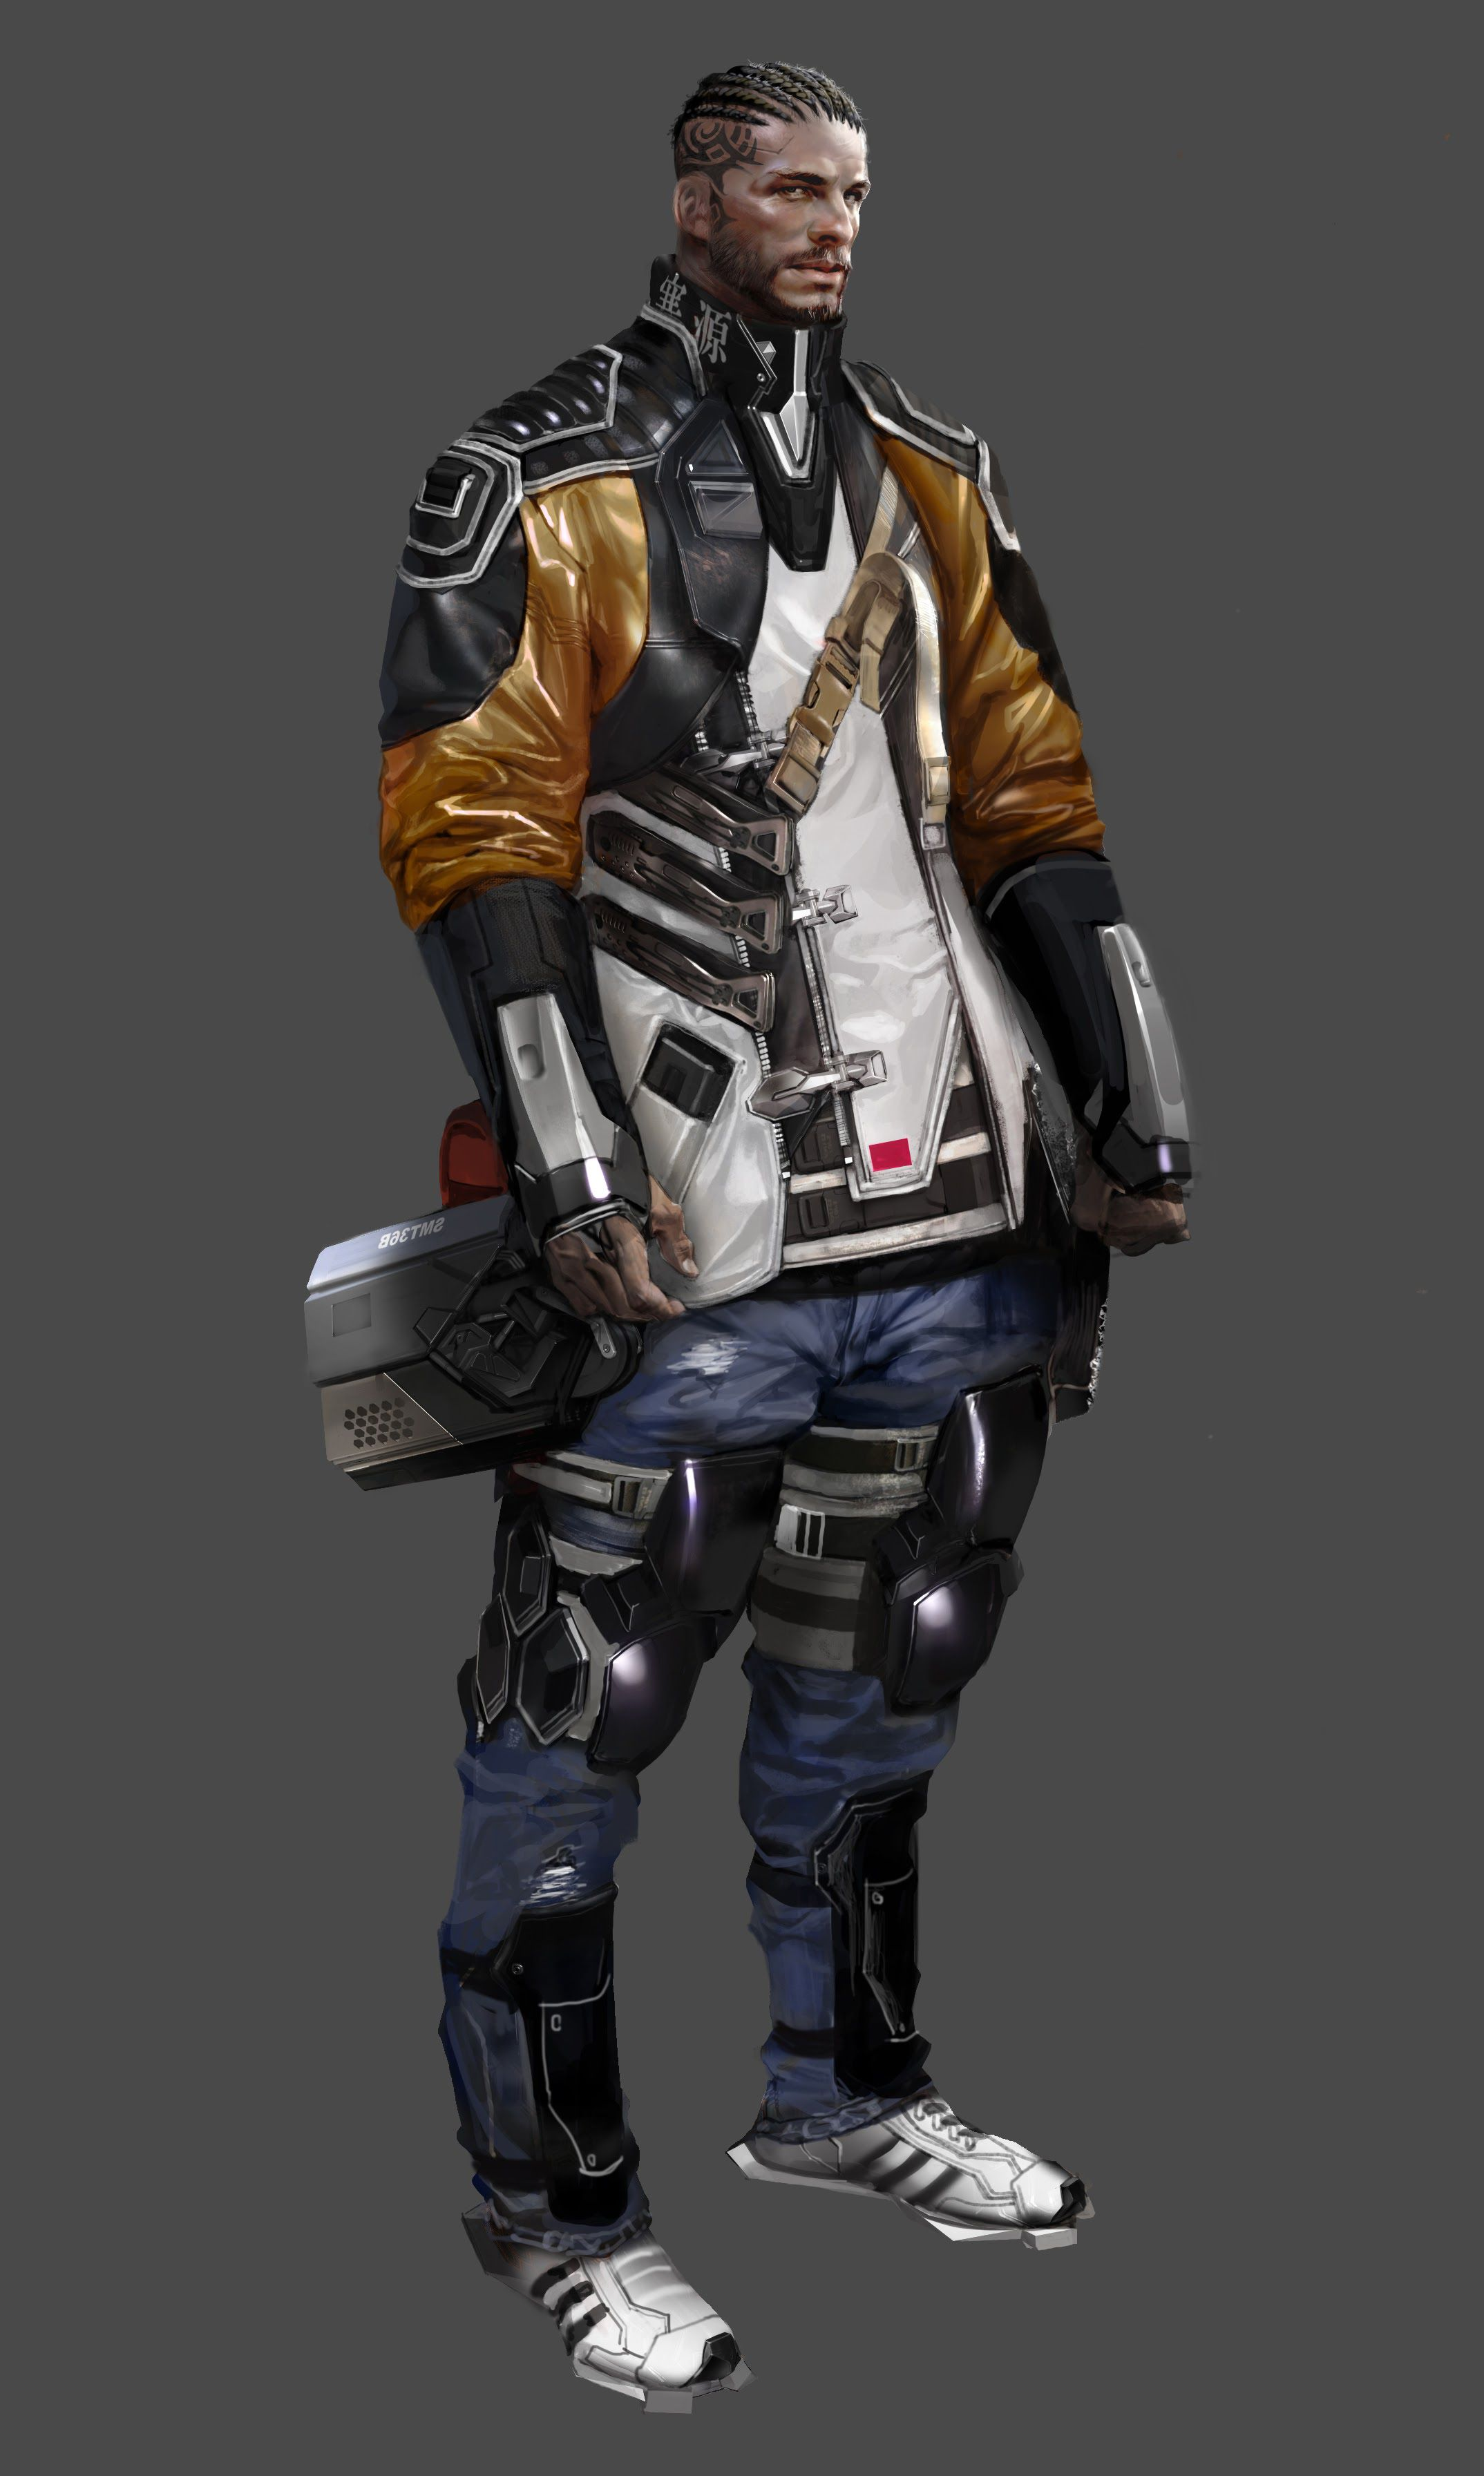 Pin on Characters: Women - Modern / Sci-Fi